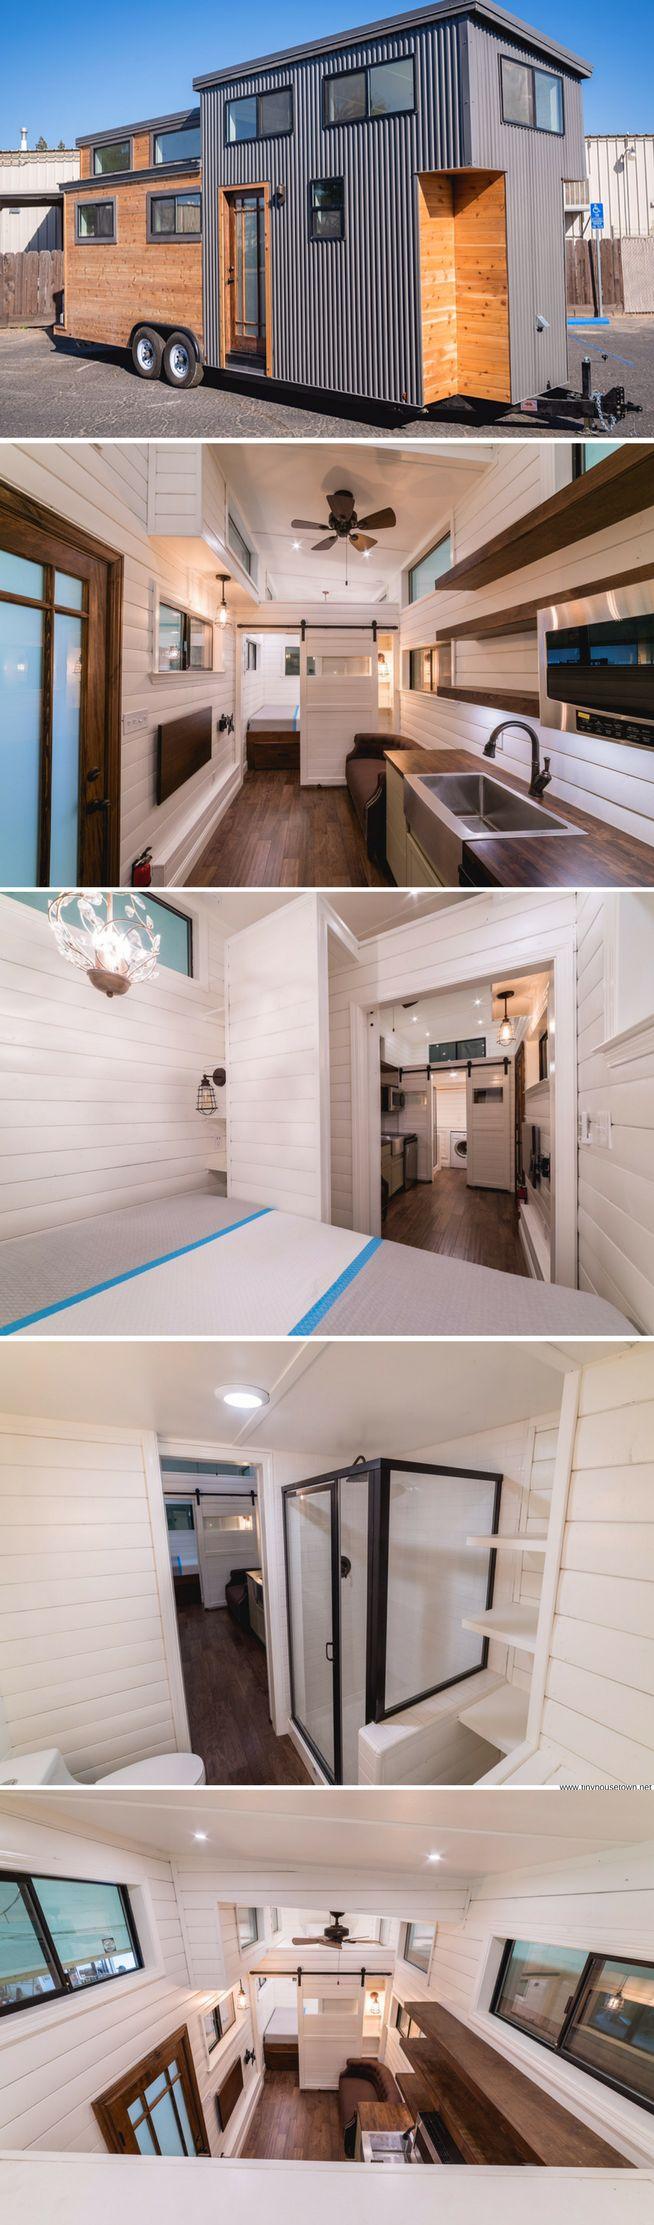 25 Best Tiny House Bedroom Ideas On Pinterest Tiny House Family